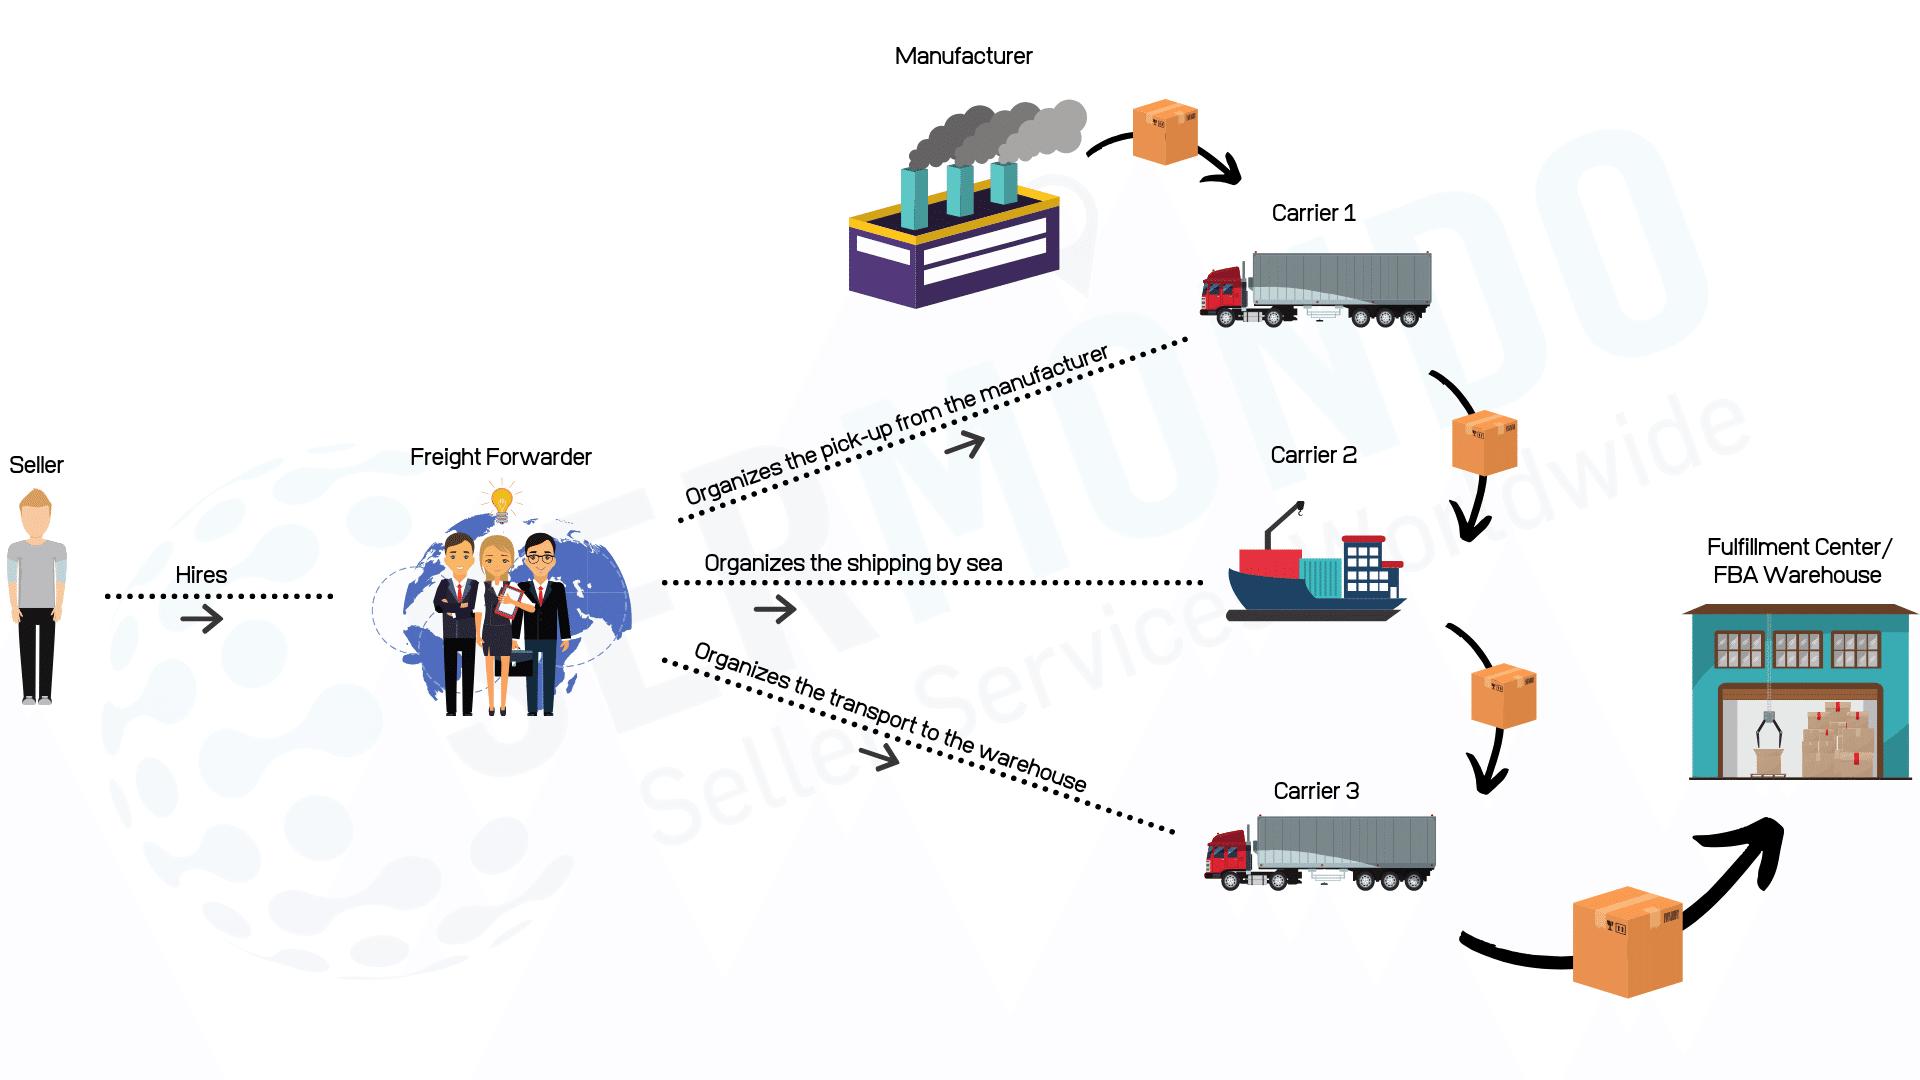 Freight Forwarder for Amazon FBA